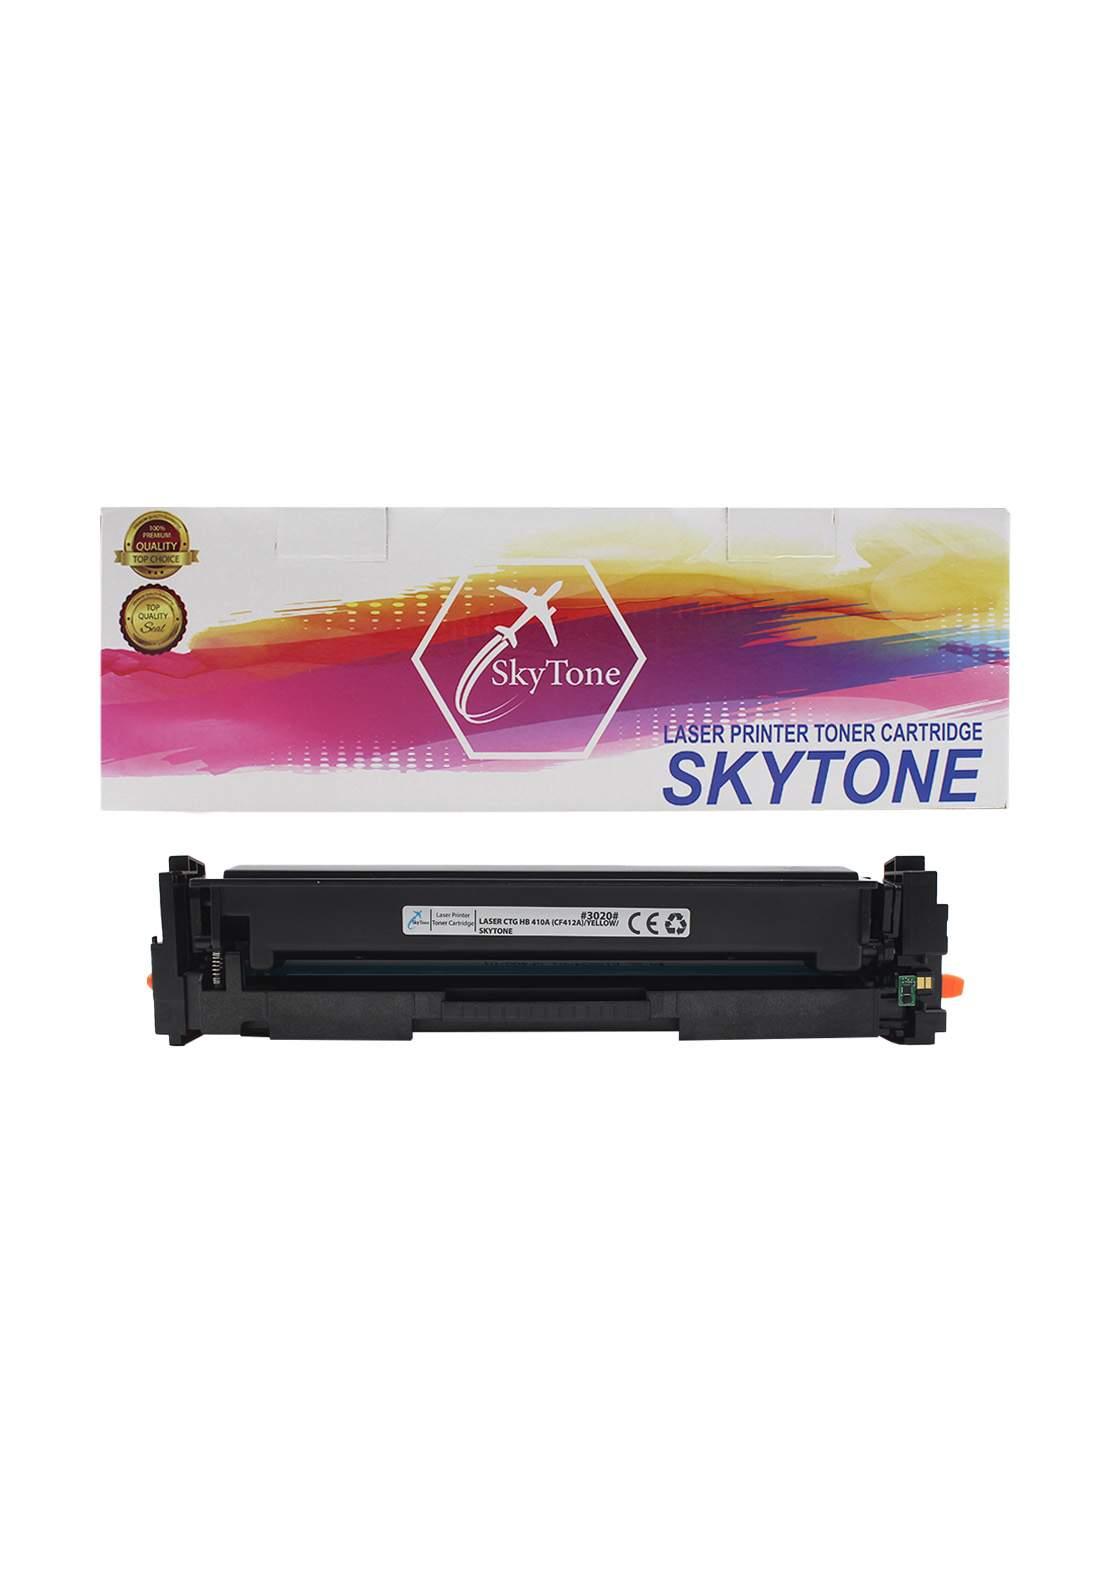 SKYTONE CTG HP 410A (CF412A) Laser Printer Toner Cartridge خرطوشة حبر